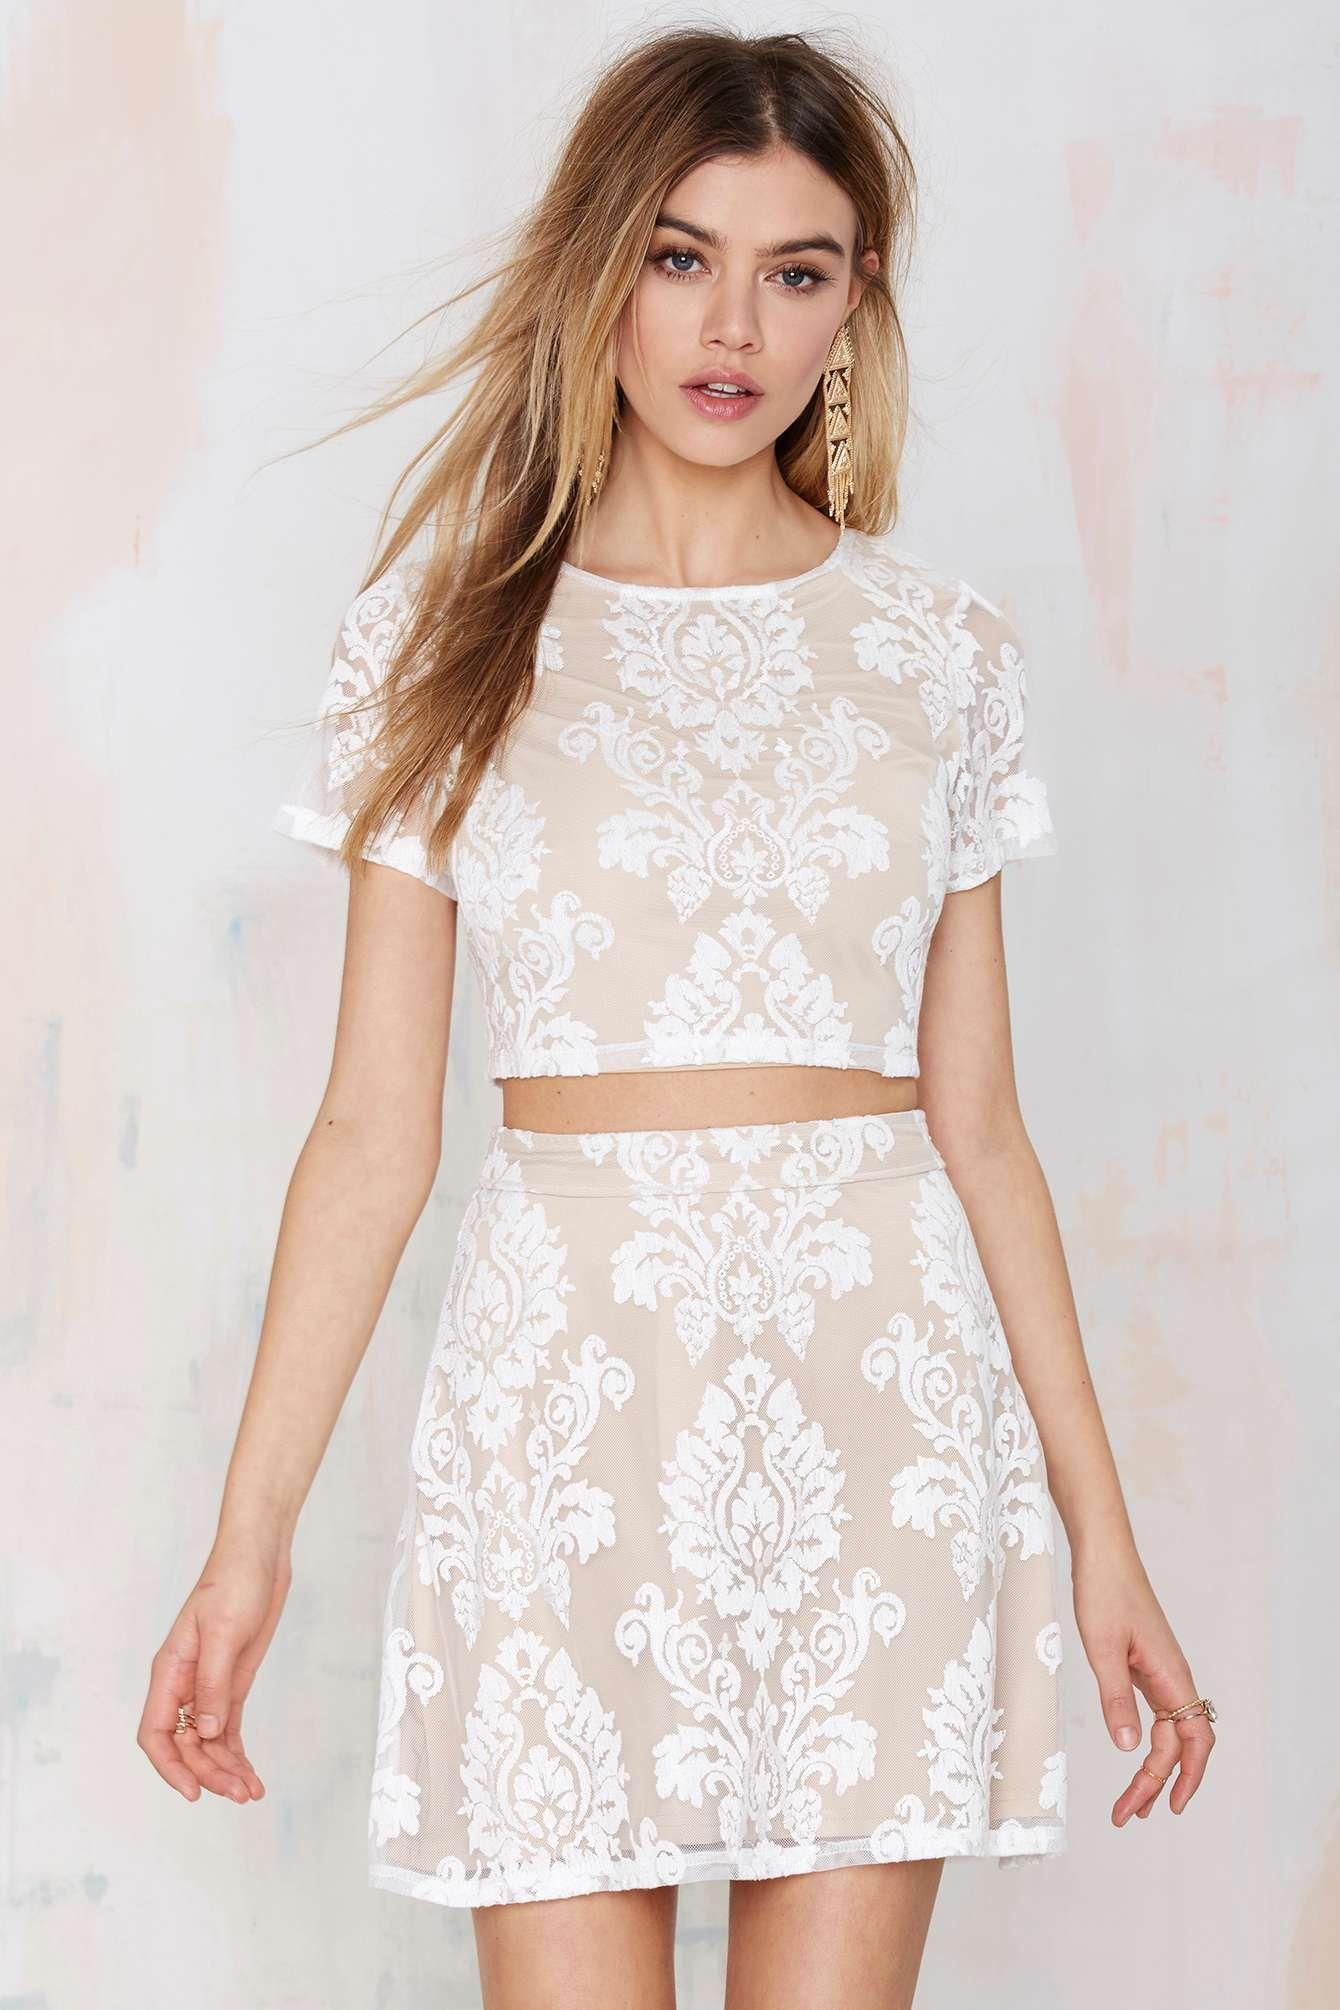 79ffd53bb5b747 Mariana Embroidered Skirt